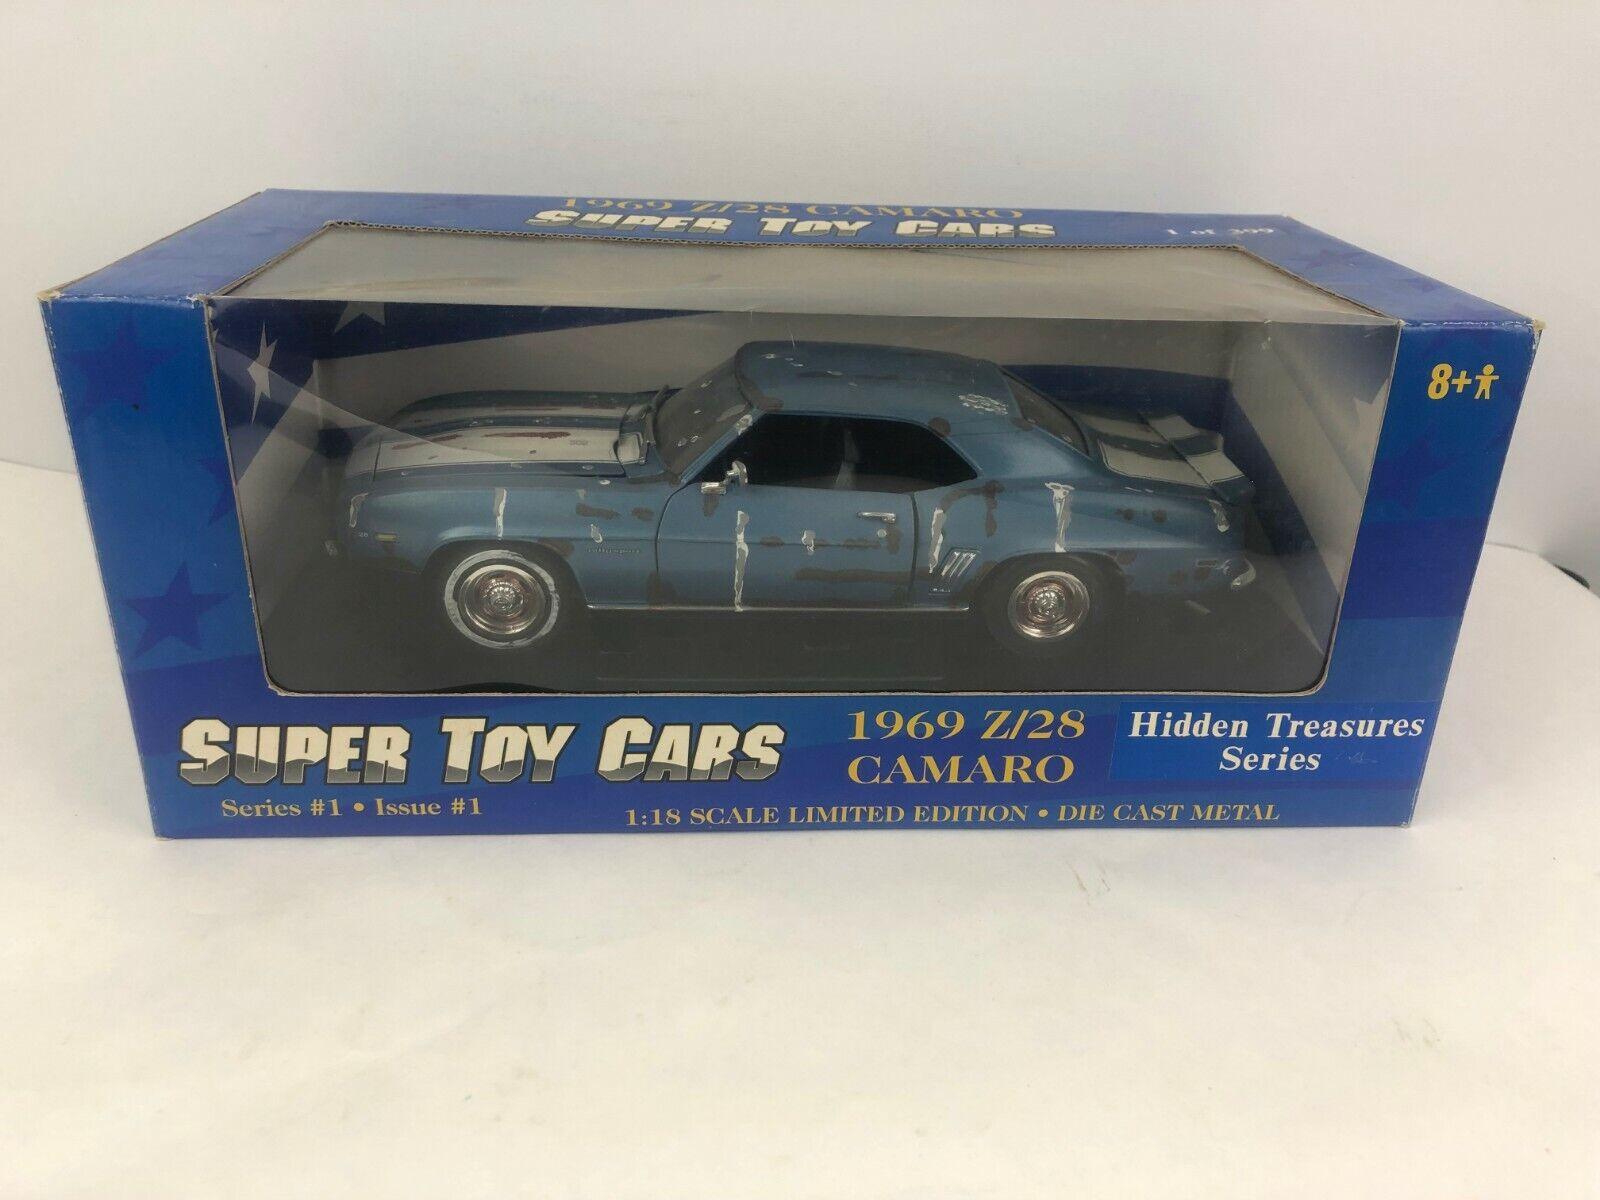 Super Toy Cars ERTL 1969 Z 28 Camaro Trésors cachés 1 de 399 1 18  29150